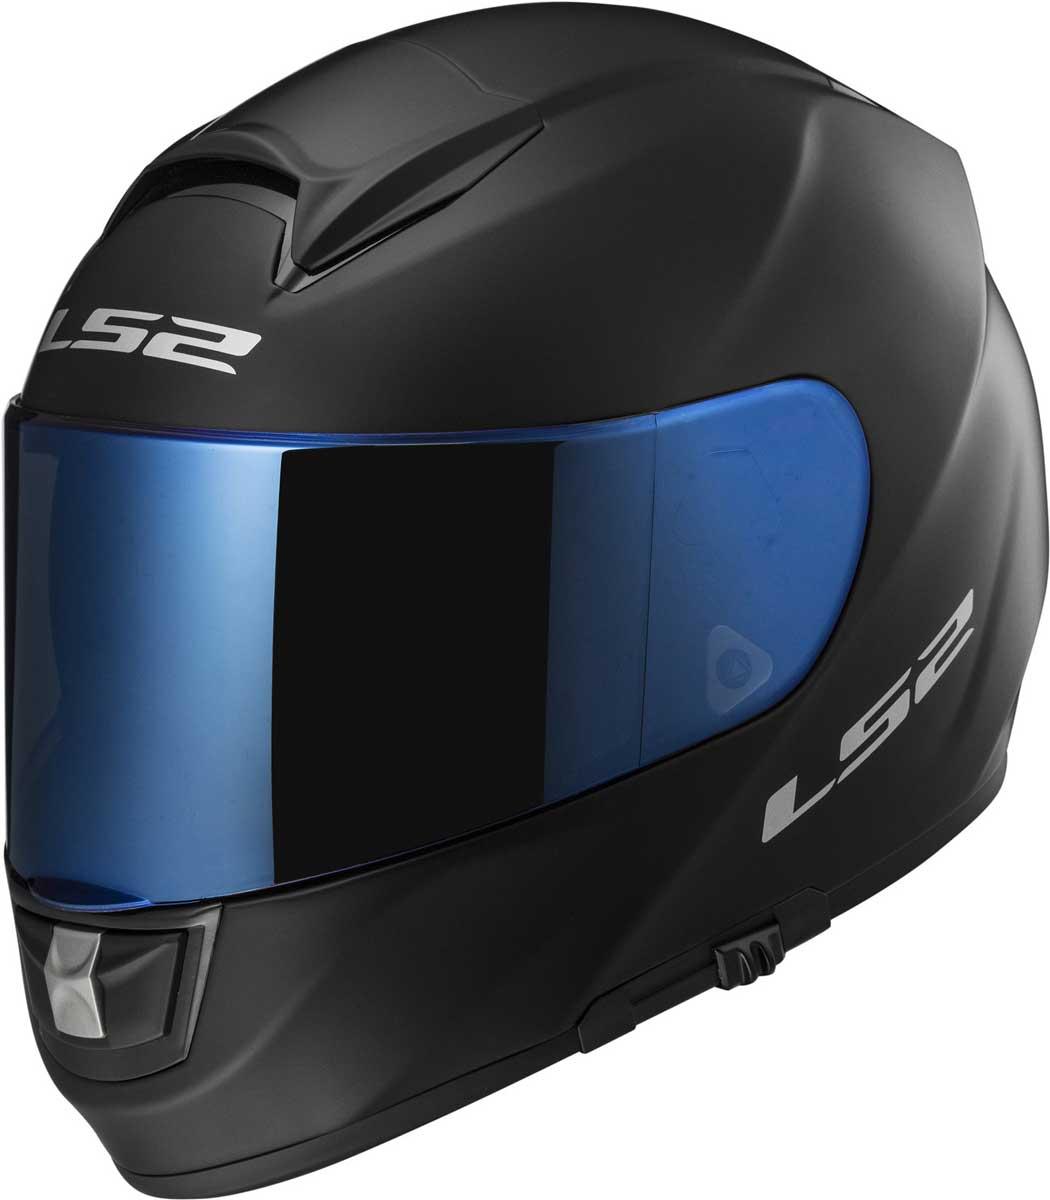 ls2 visier iridium blau f r den ff397 vector cs bikewear. Black Bedroom Furniture Sets. Home Design Ideas